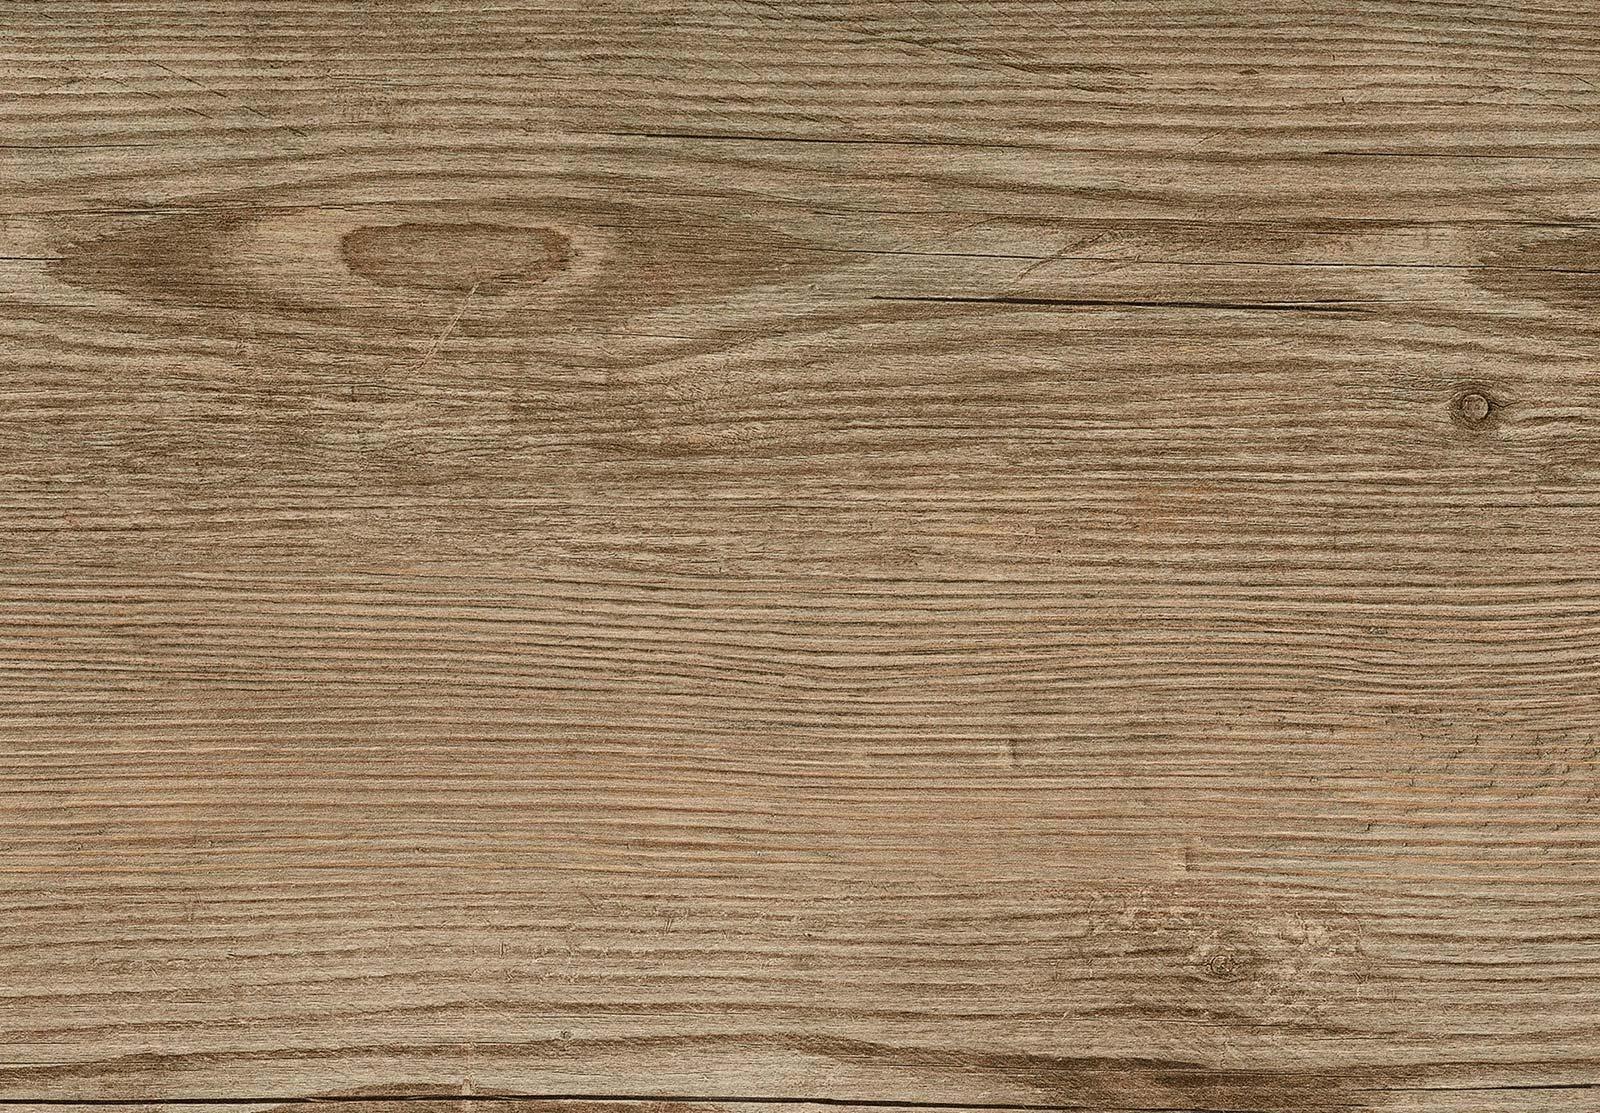 Pannelli alfawood - Energy Pine Beige 7102